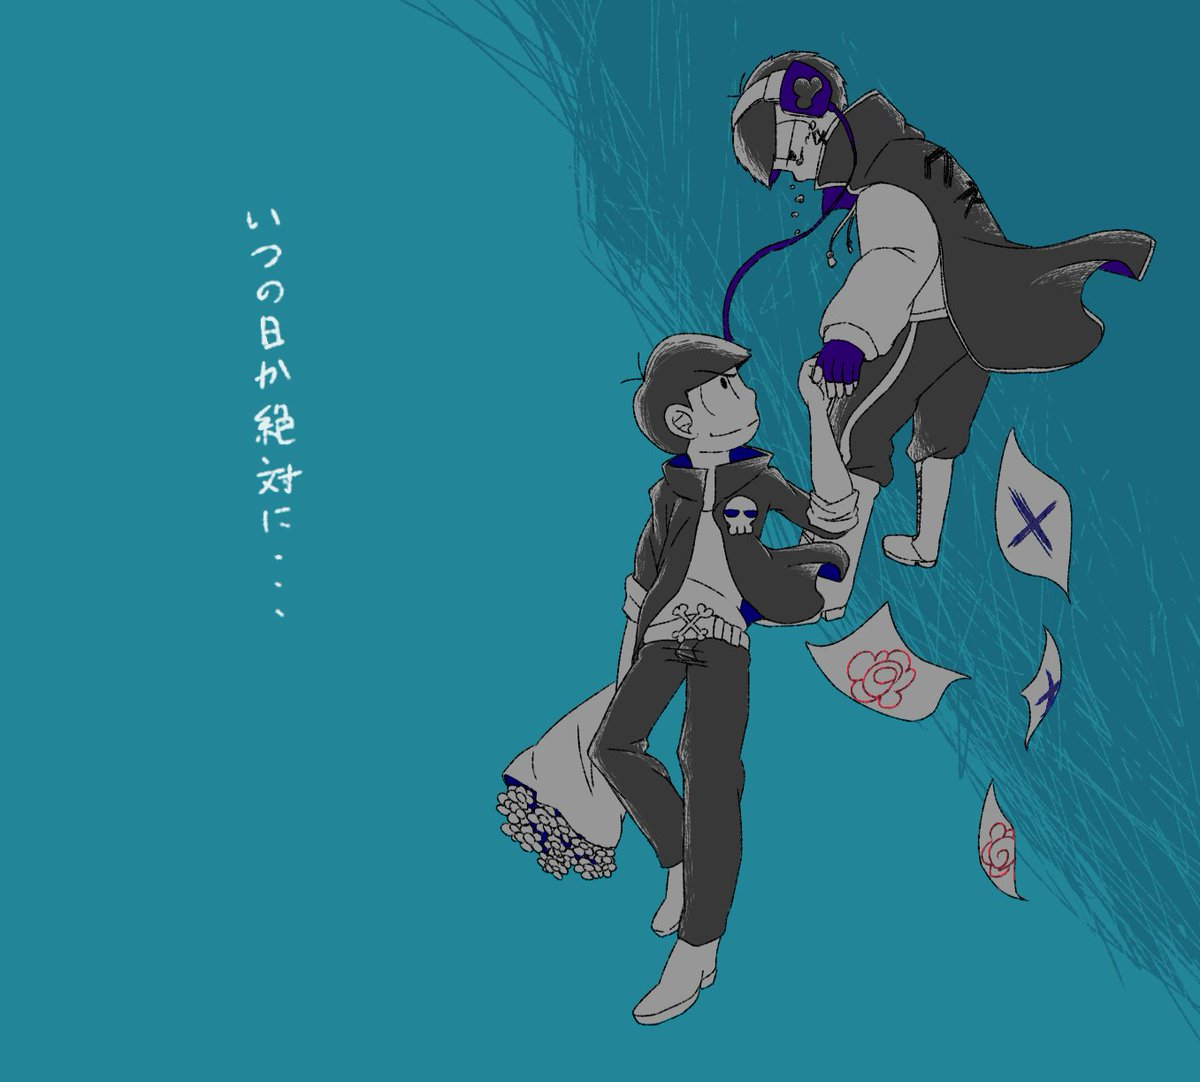 Tweet おそ松さん泣ける六つ子の感動系二次イラストまとめ 最終